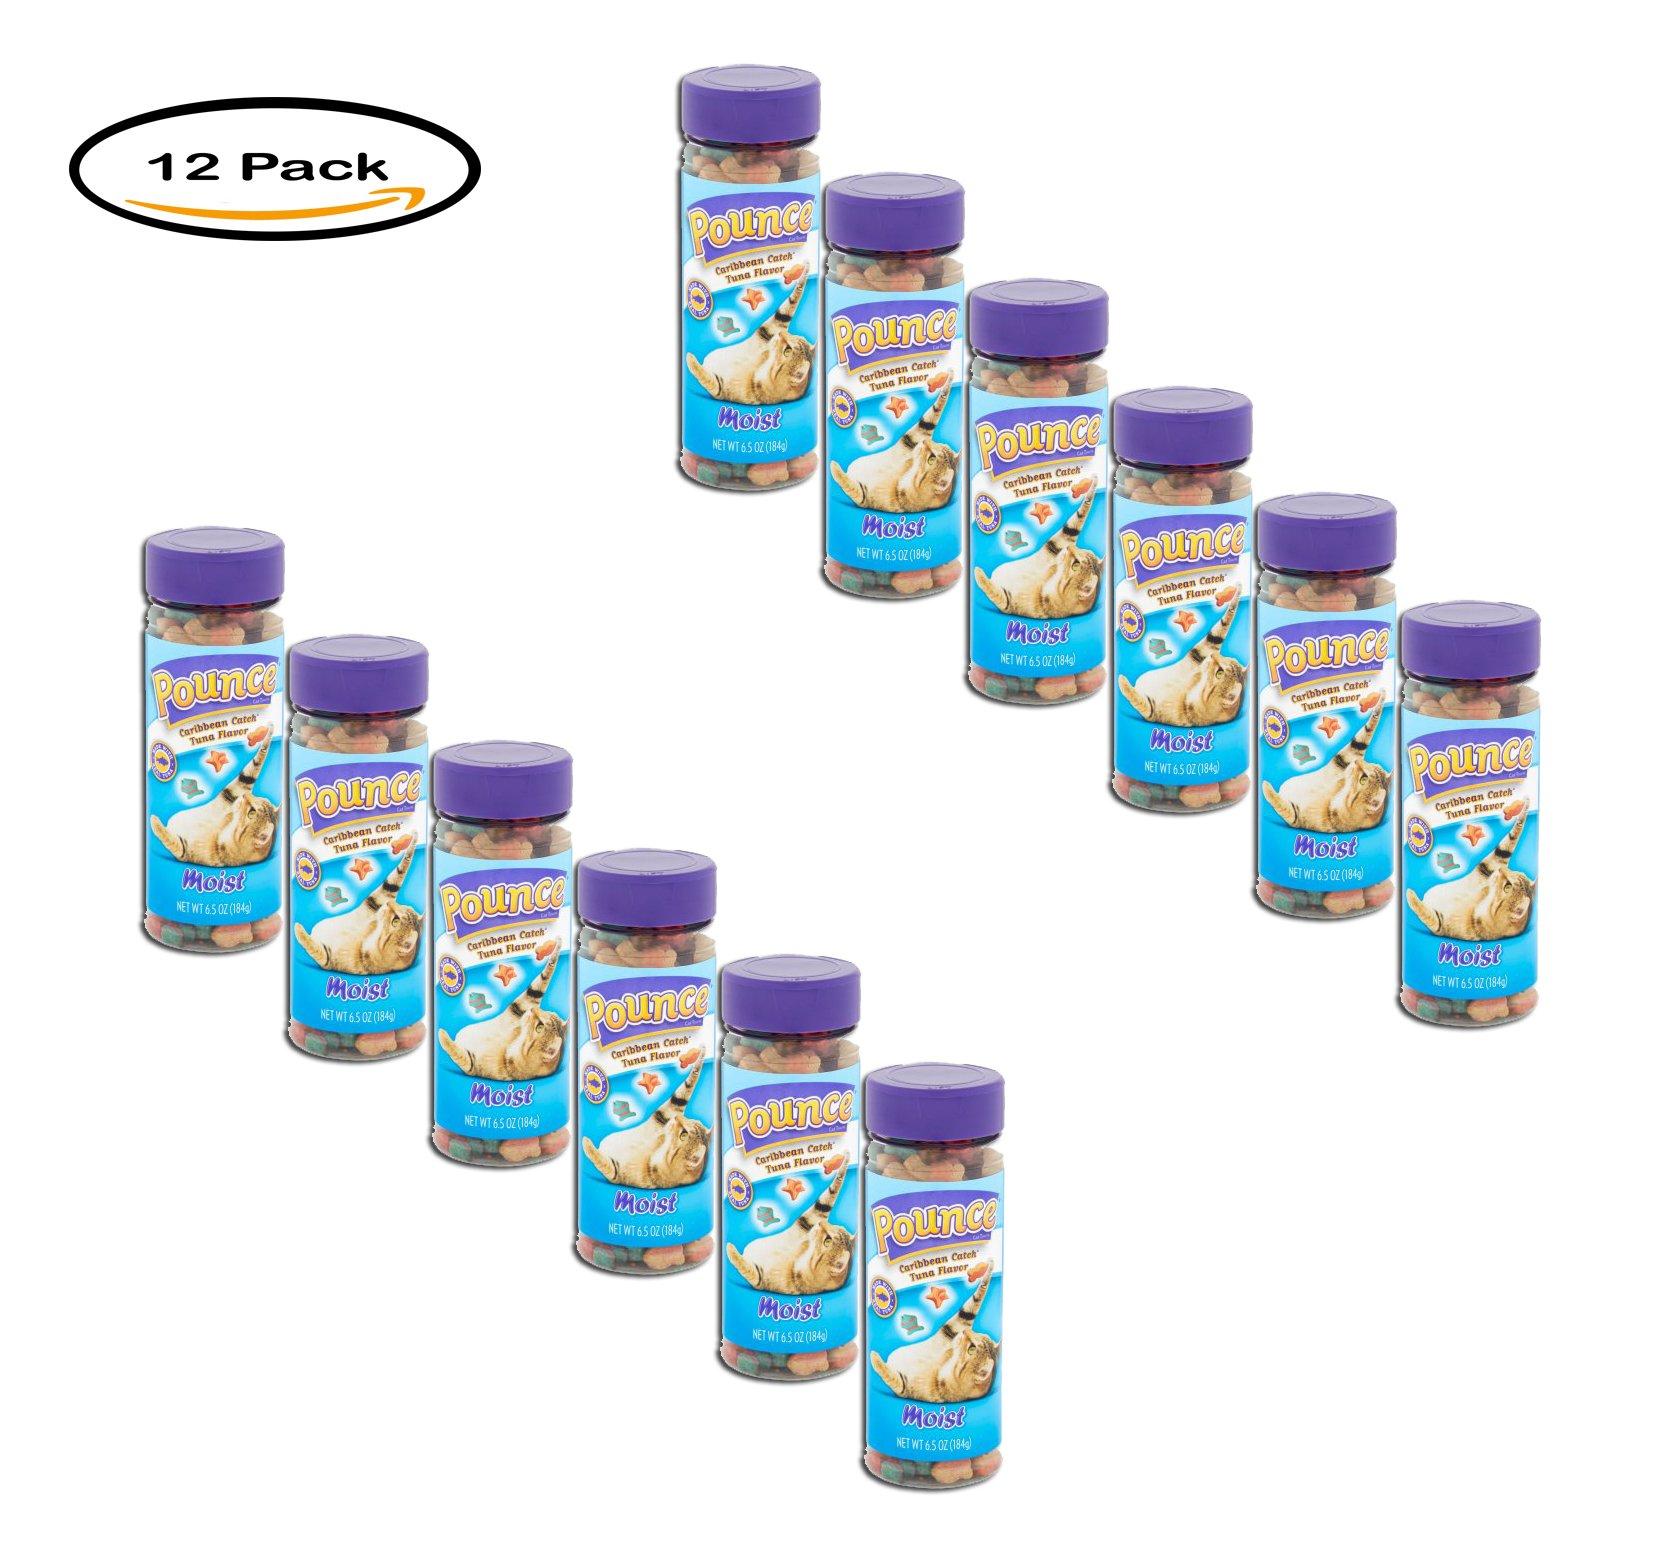 PACK OF 12 - Pounce Caribbean Catch Moist Tuna Flavor Cat Treats, 6.5 oz